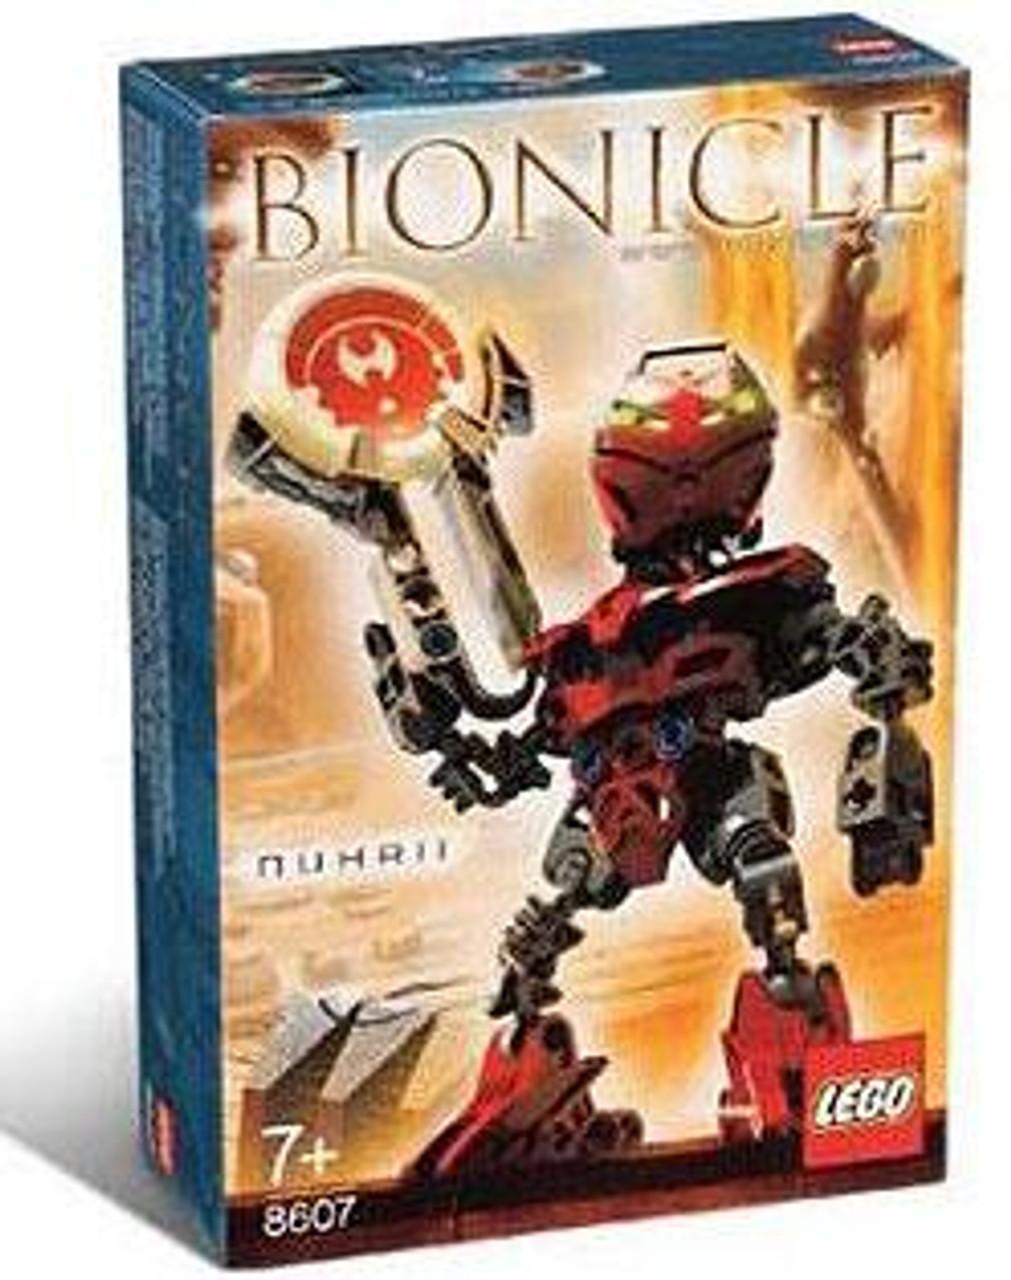 LEGO Bionicle Matoran of Metru Nui Nuhrii Set #8607